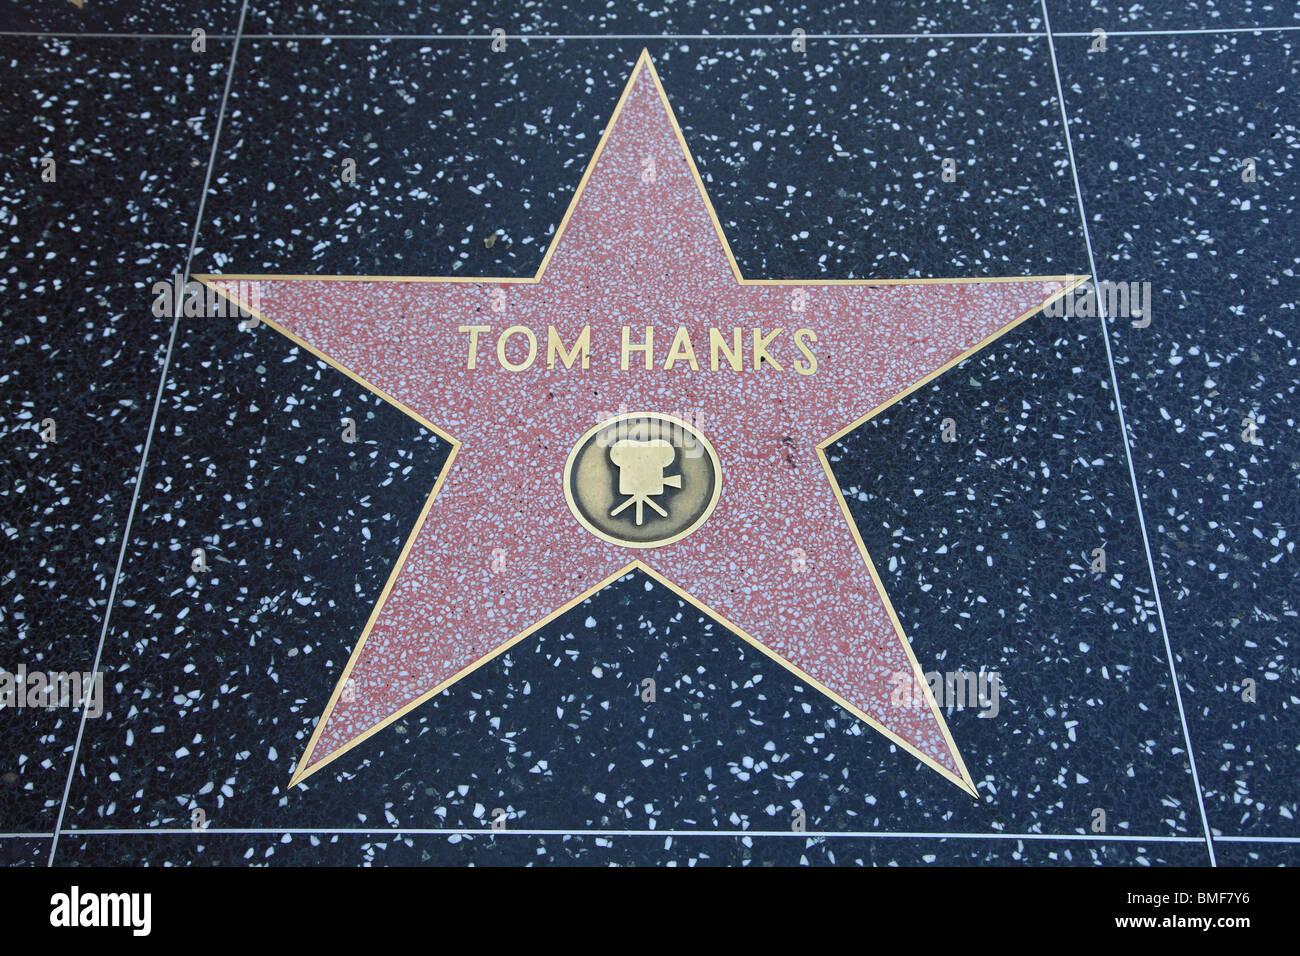 Tom Hanks Star, Hollywood Walk of Fame, Hollywood Boulevard, Los Angeles, Kalifornien, USA Stockbild